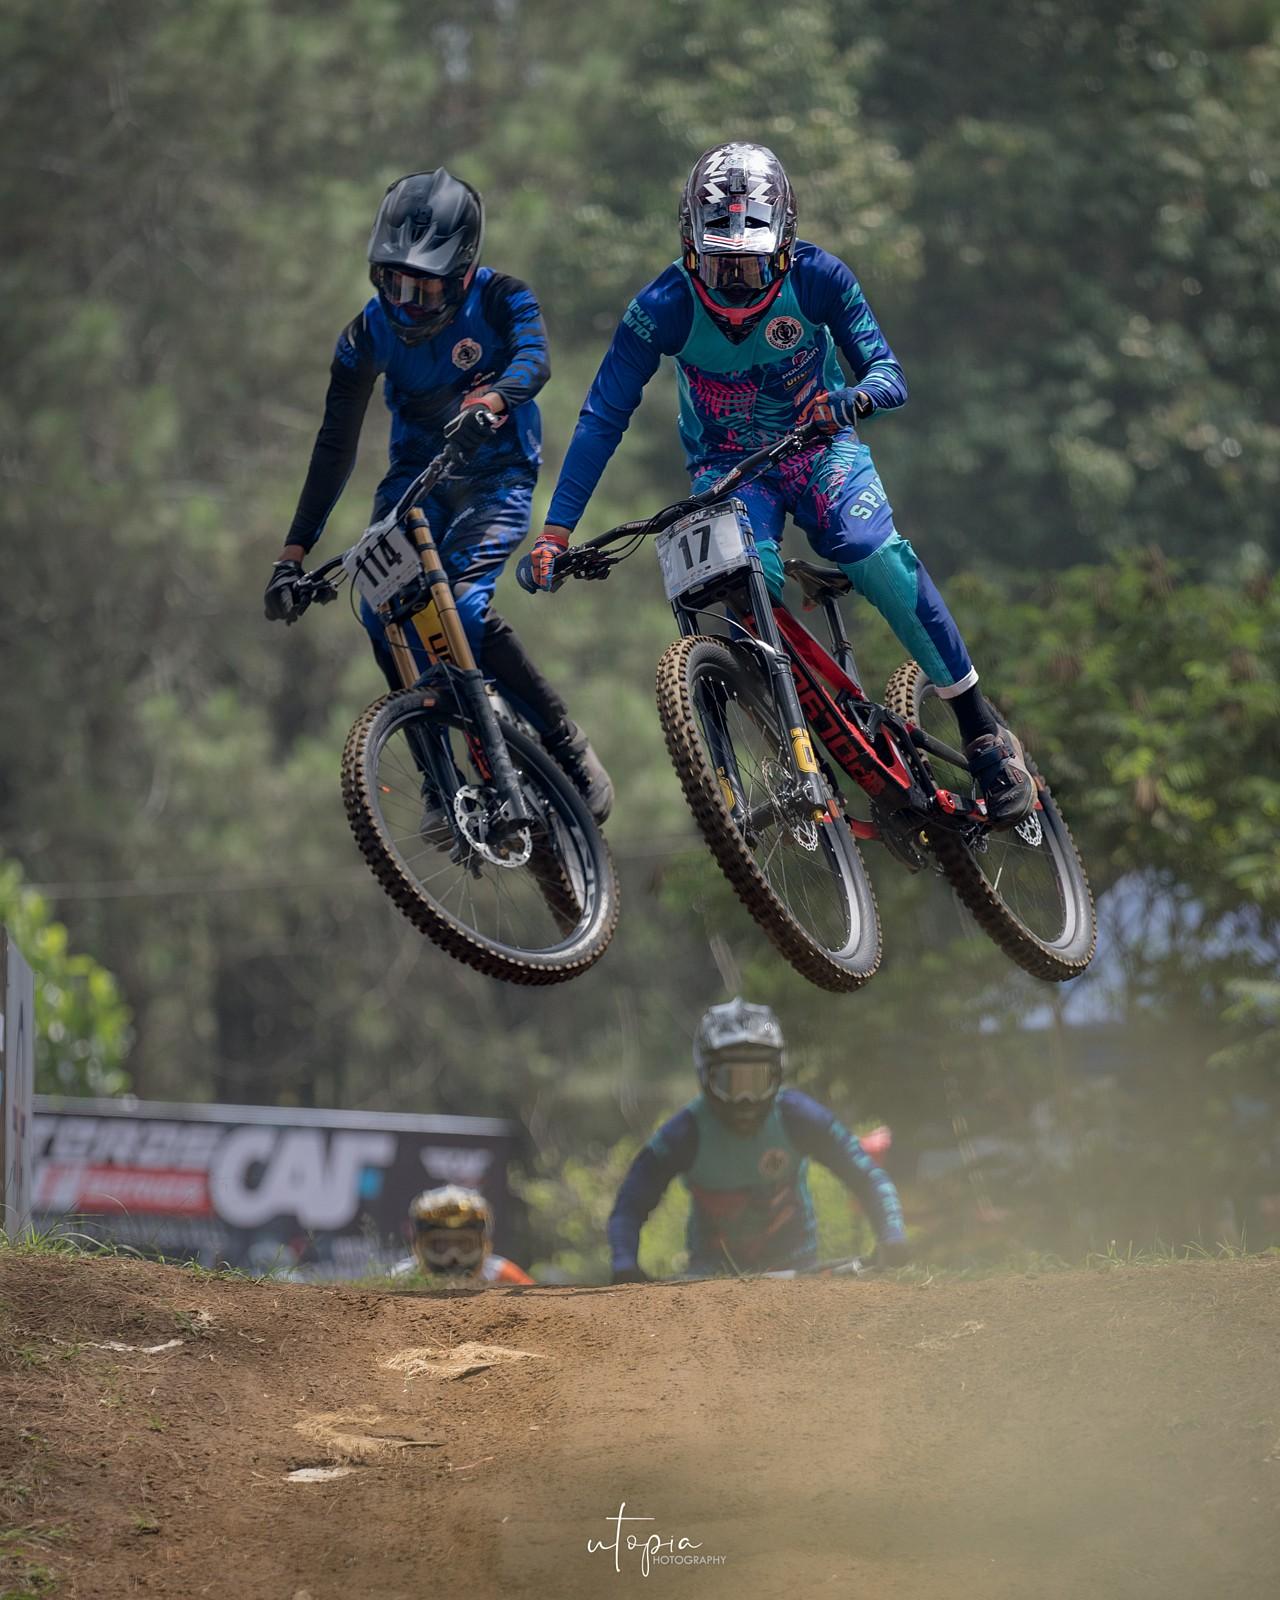 Till death do us part - utopiaarch - Mountain Biking Pictures - Vital MTB